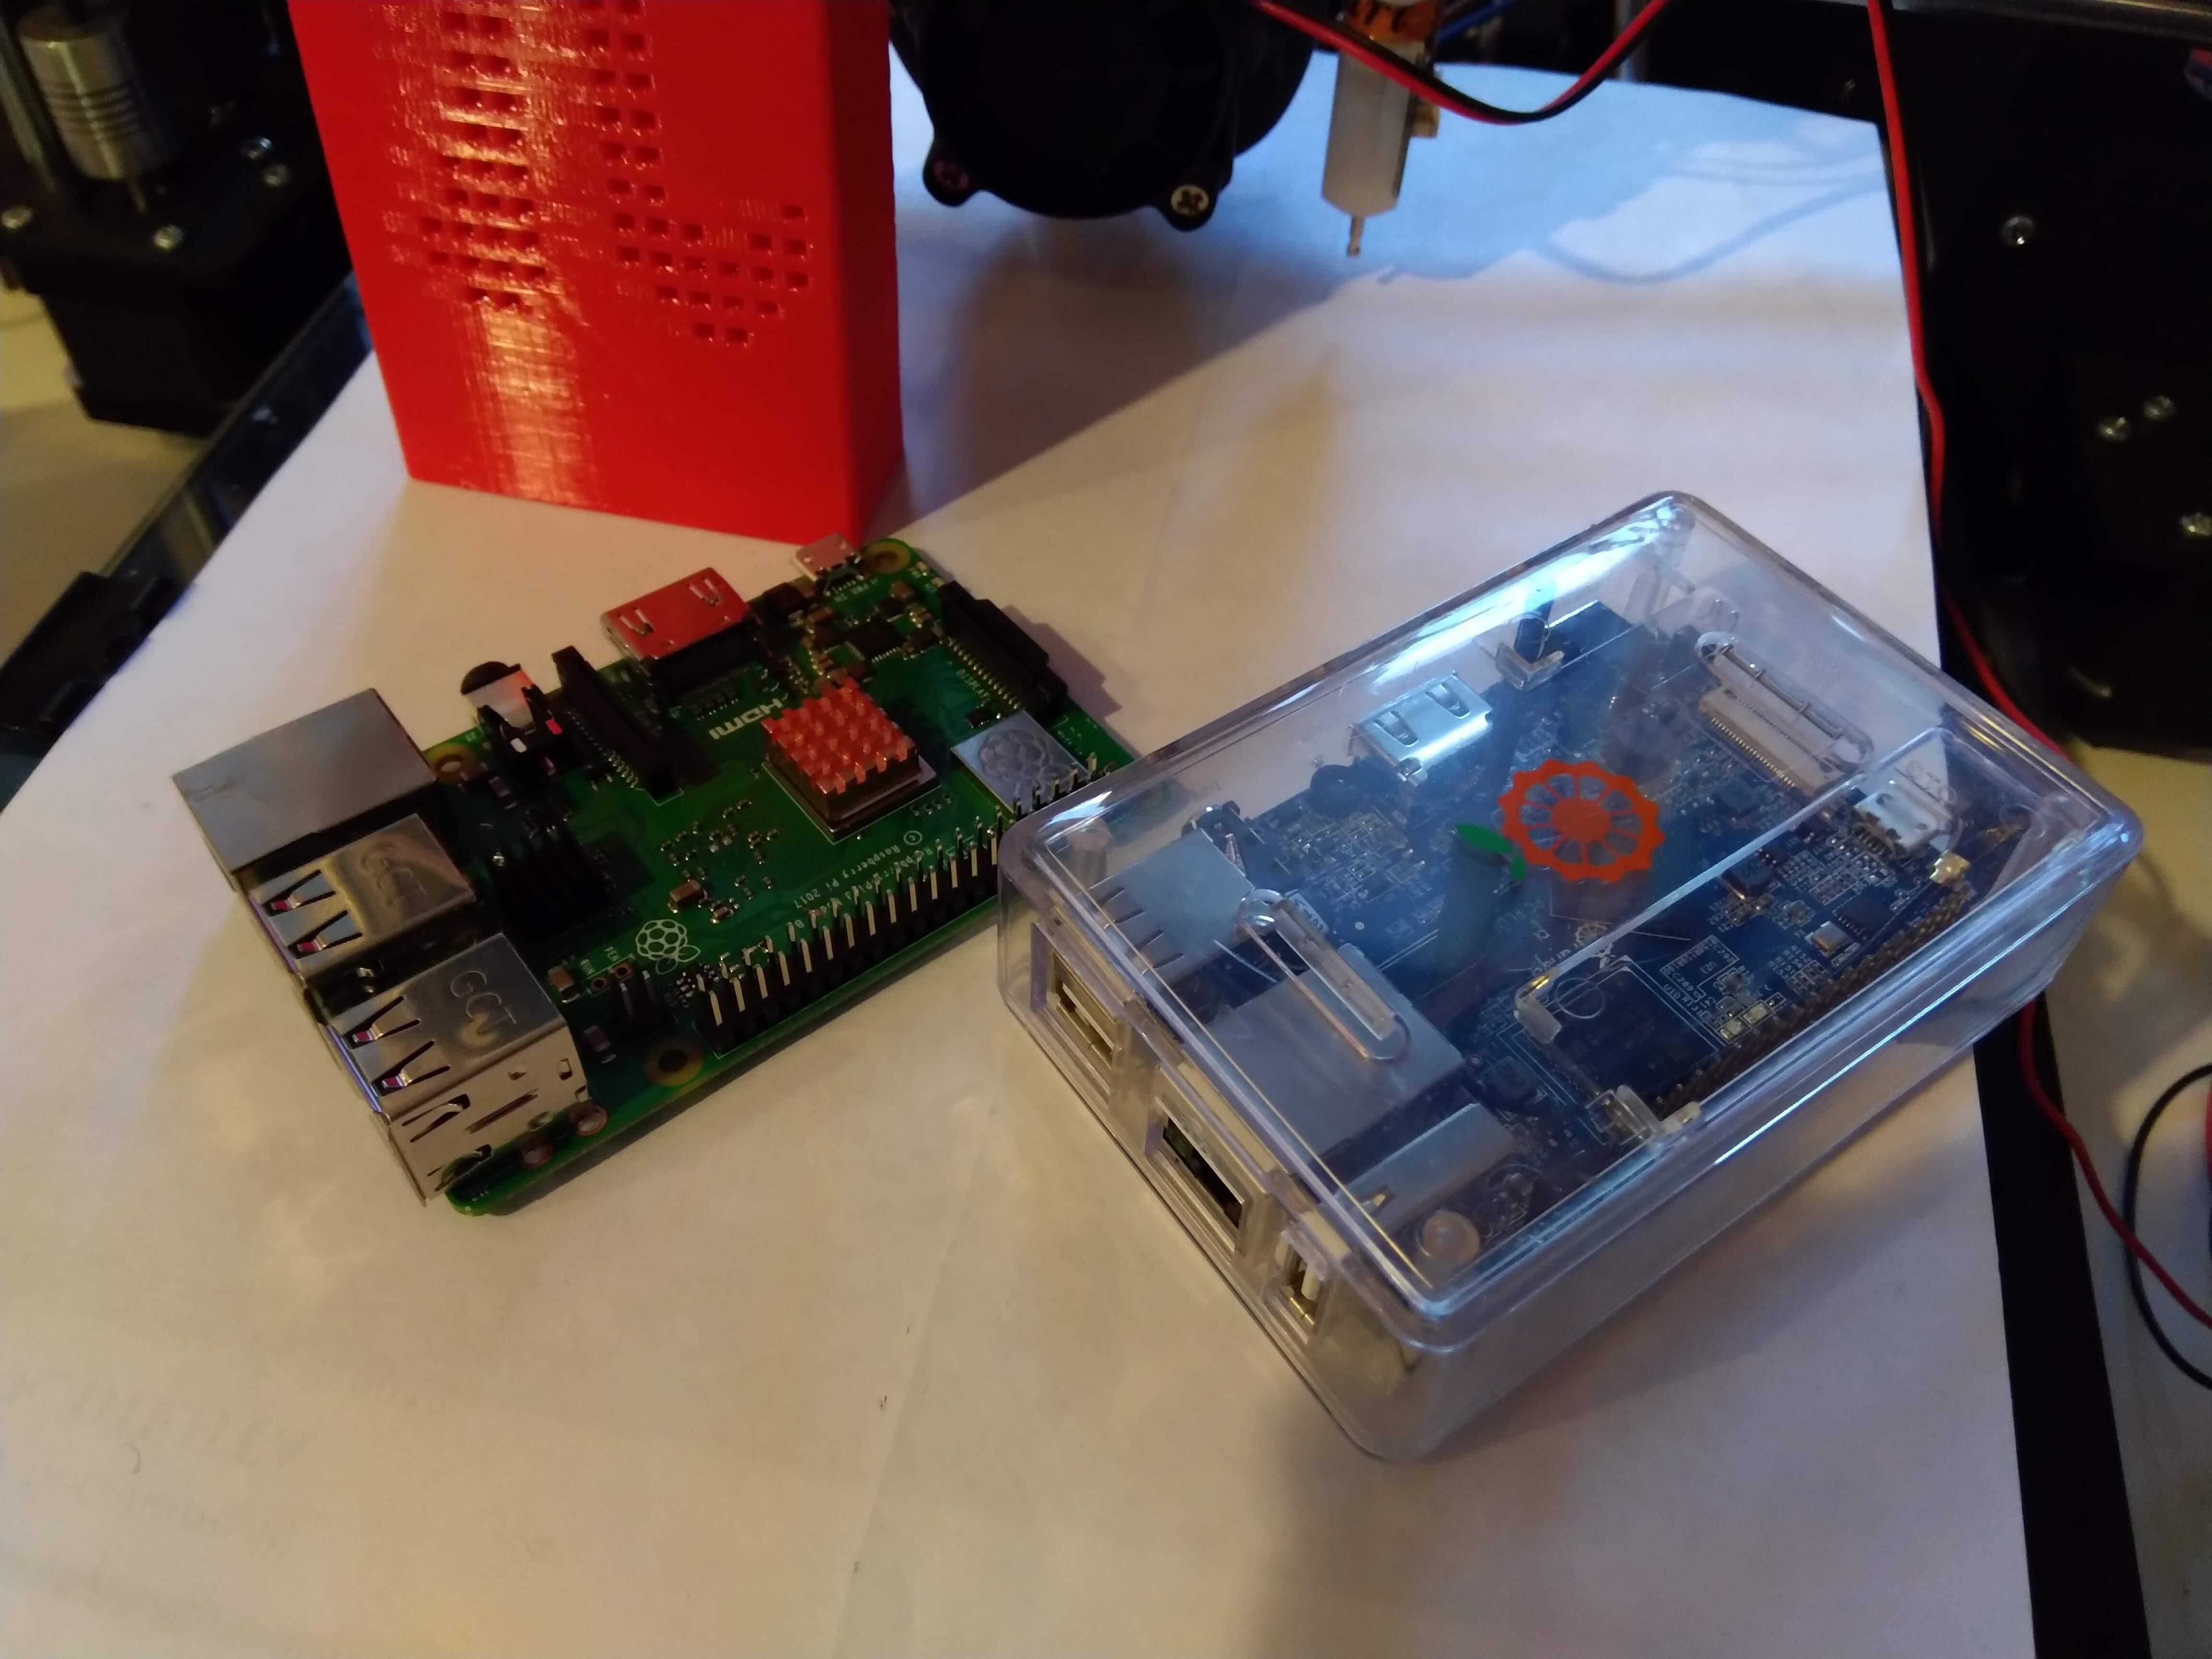 Фруктовые разборки: Orange Pi PC Plus или Raspberry Pi 3B+